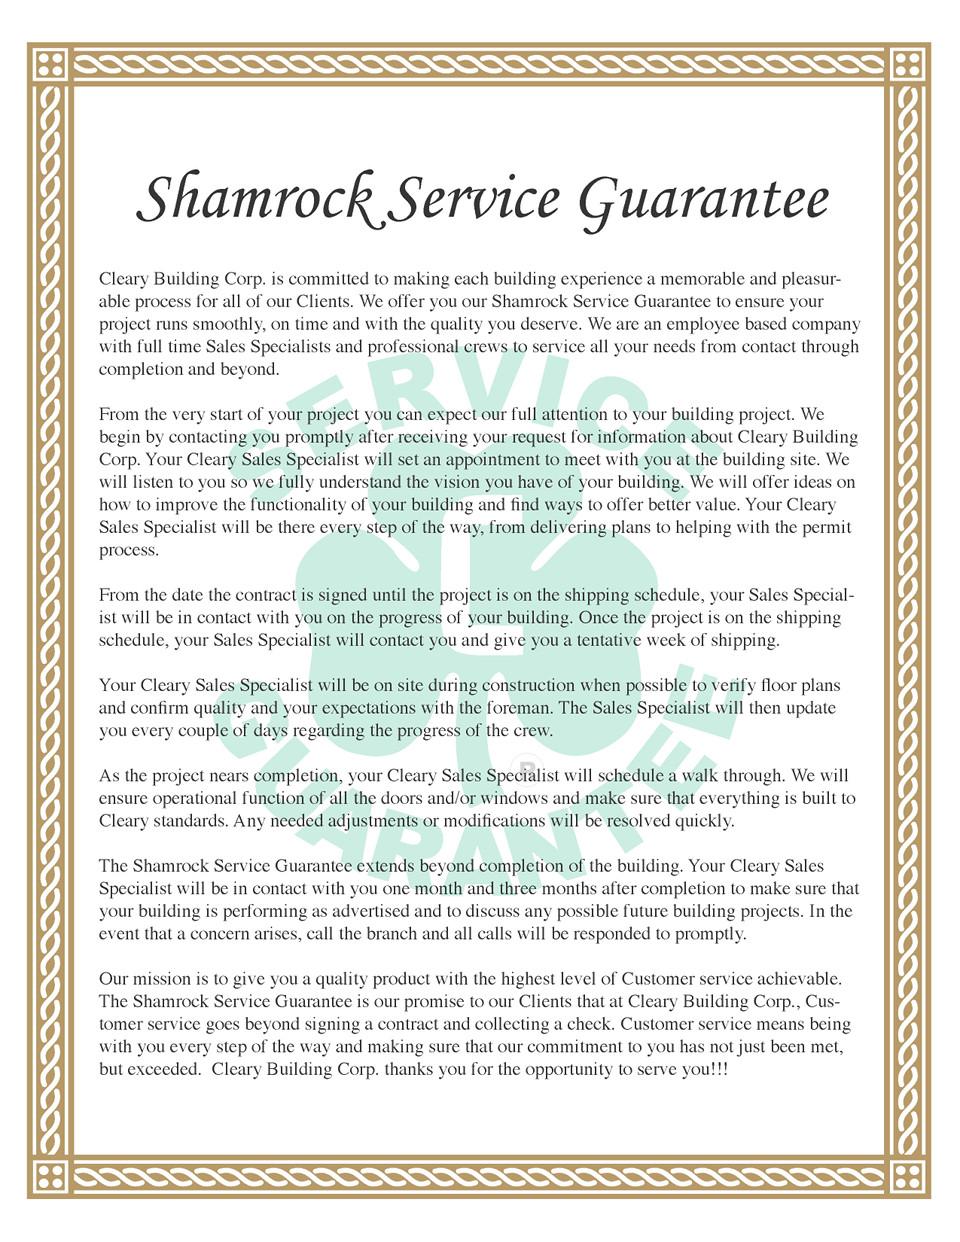 Service Guarantee 0410